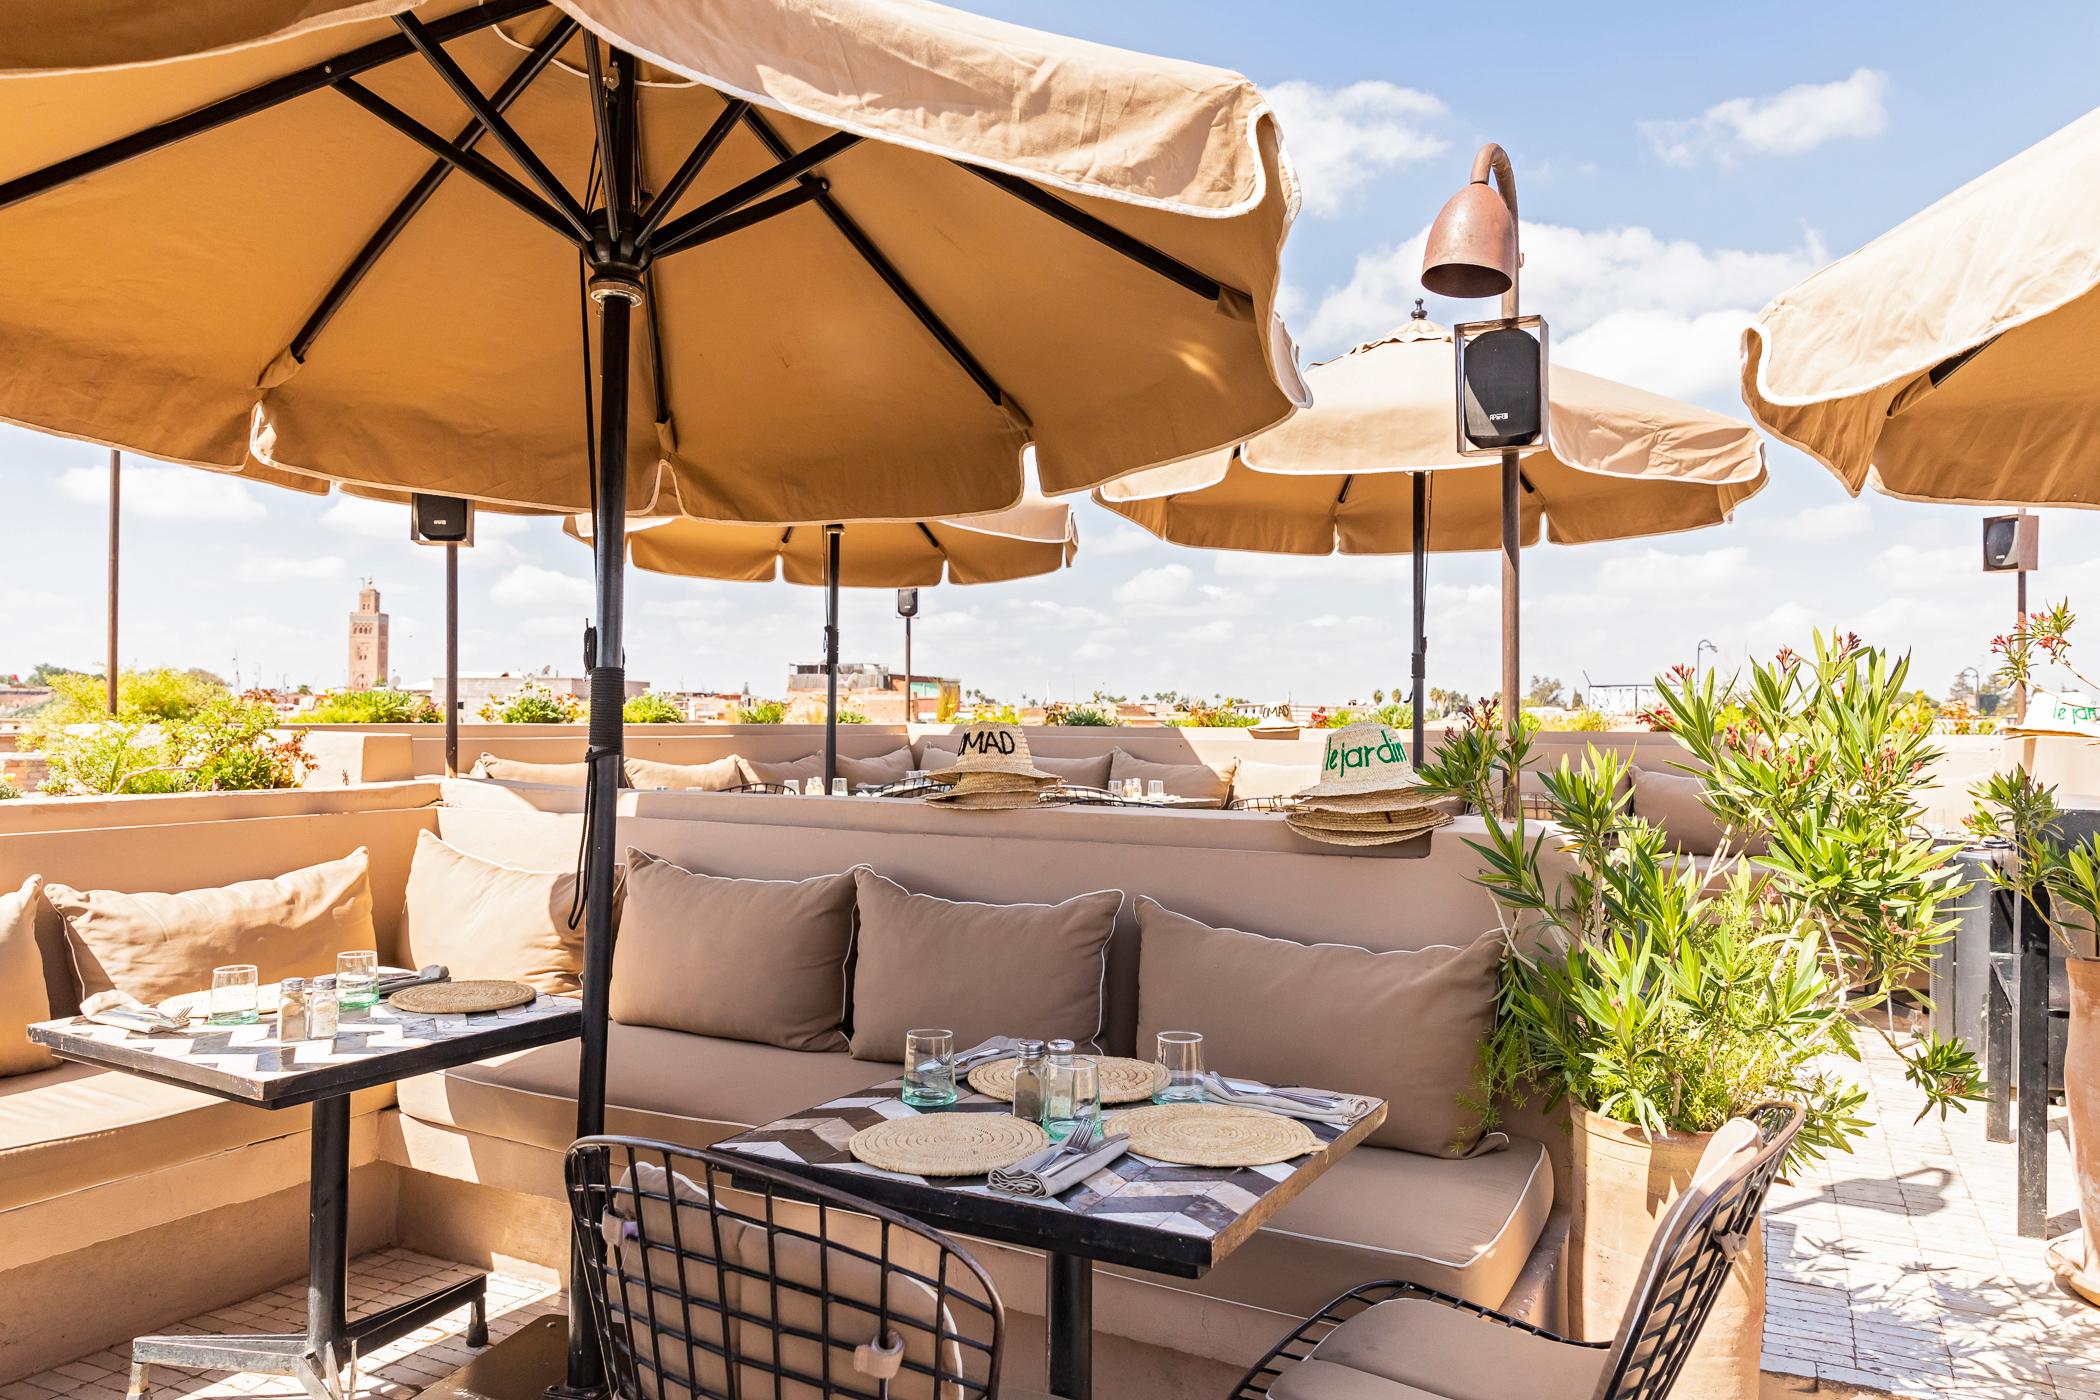 homtastics-Nomad-Restaurant-Marrakesh-Rooftop